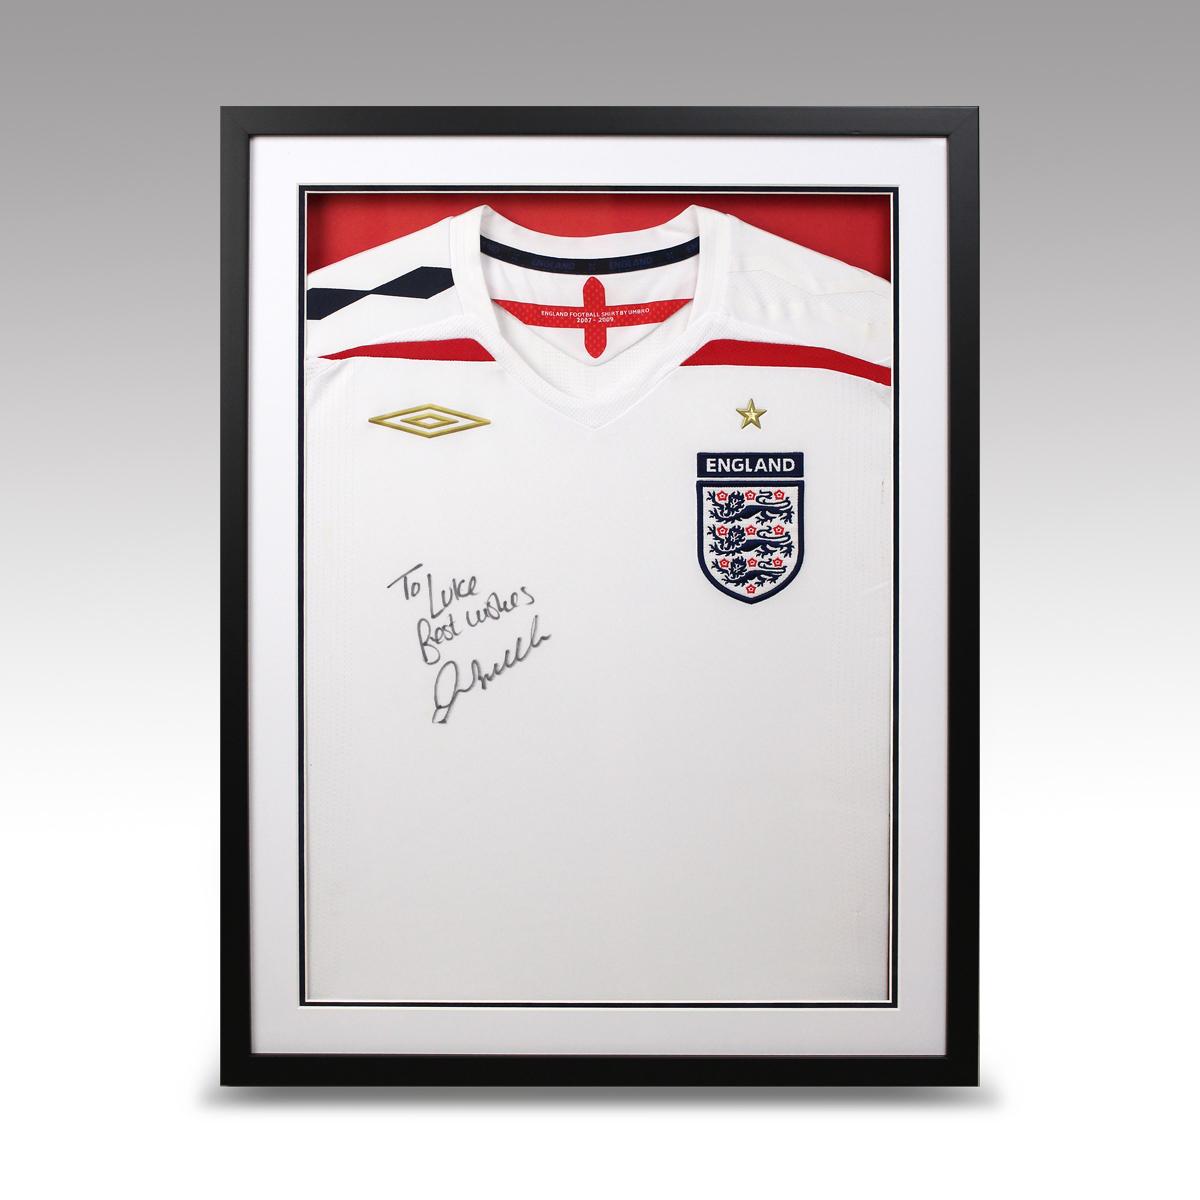 PhotoWizards-web-1200x1200-England-Framed-Shirt.jpg